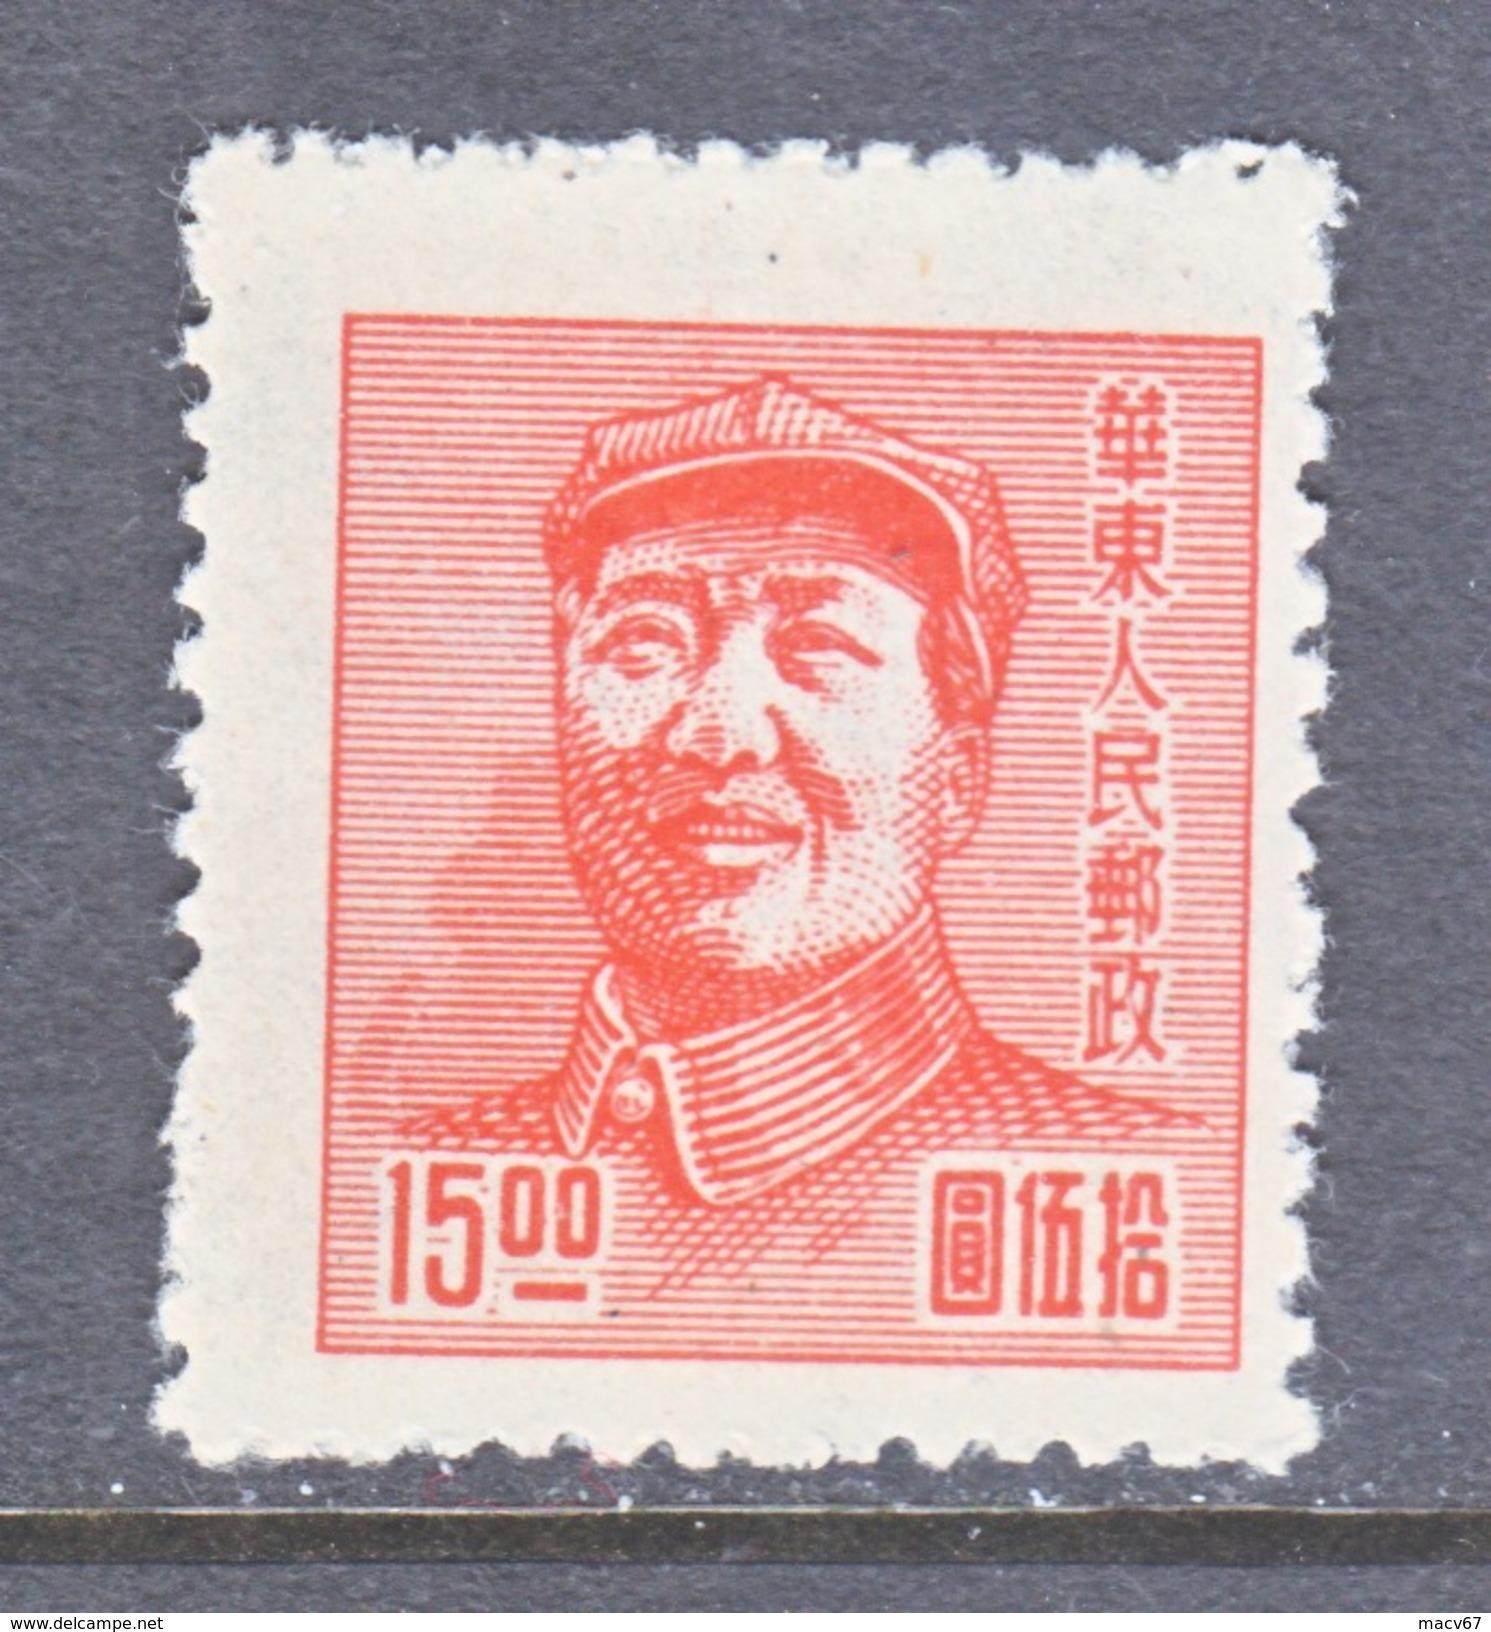 P.R. C. LIBERATED  AREA  EAST  CHINA  5 L 83   * - China